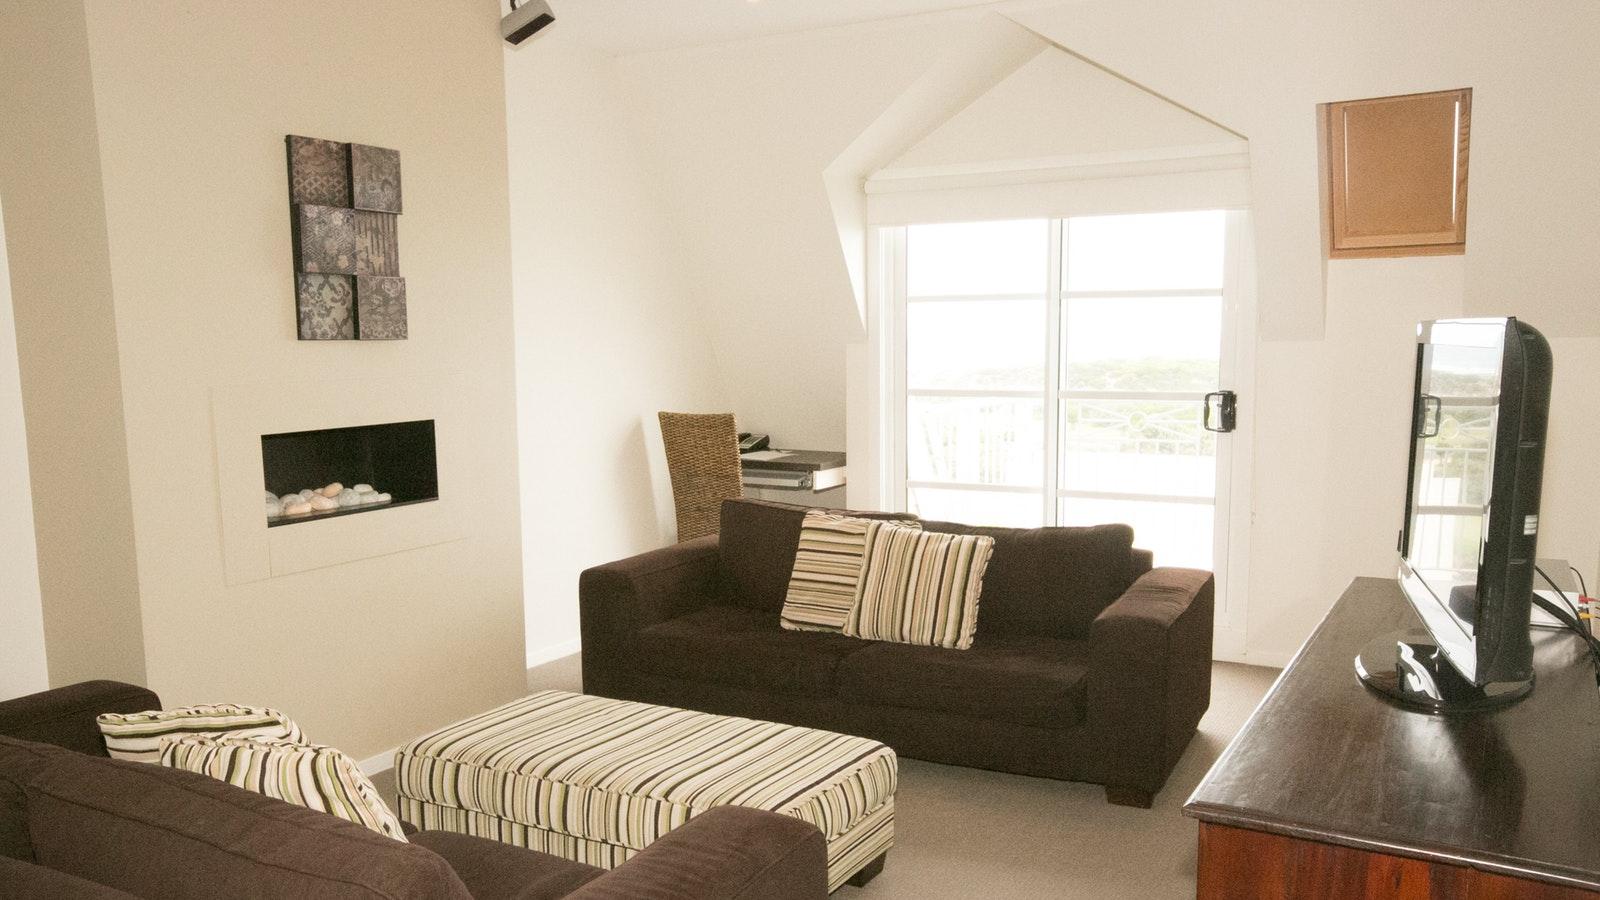 Penthouse lounge room